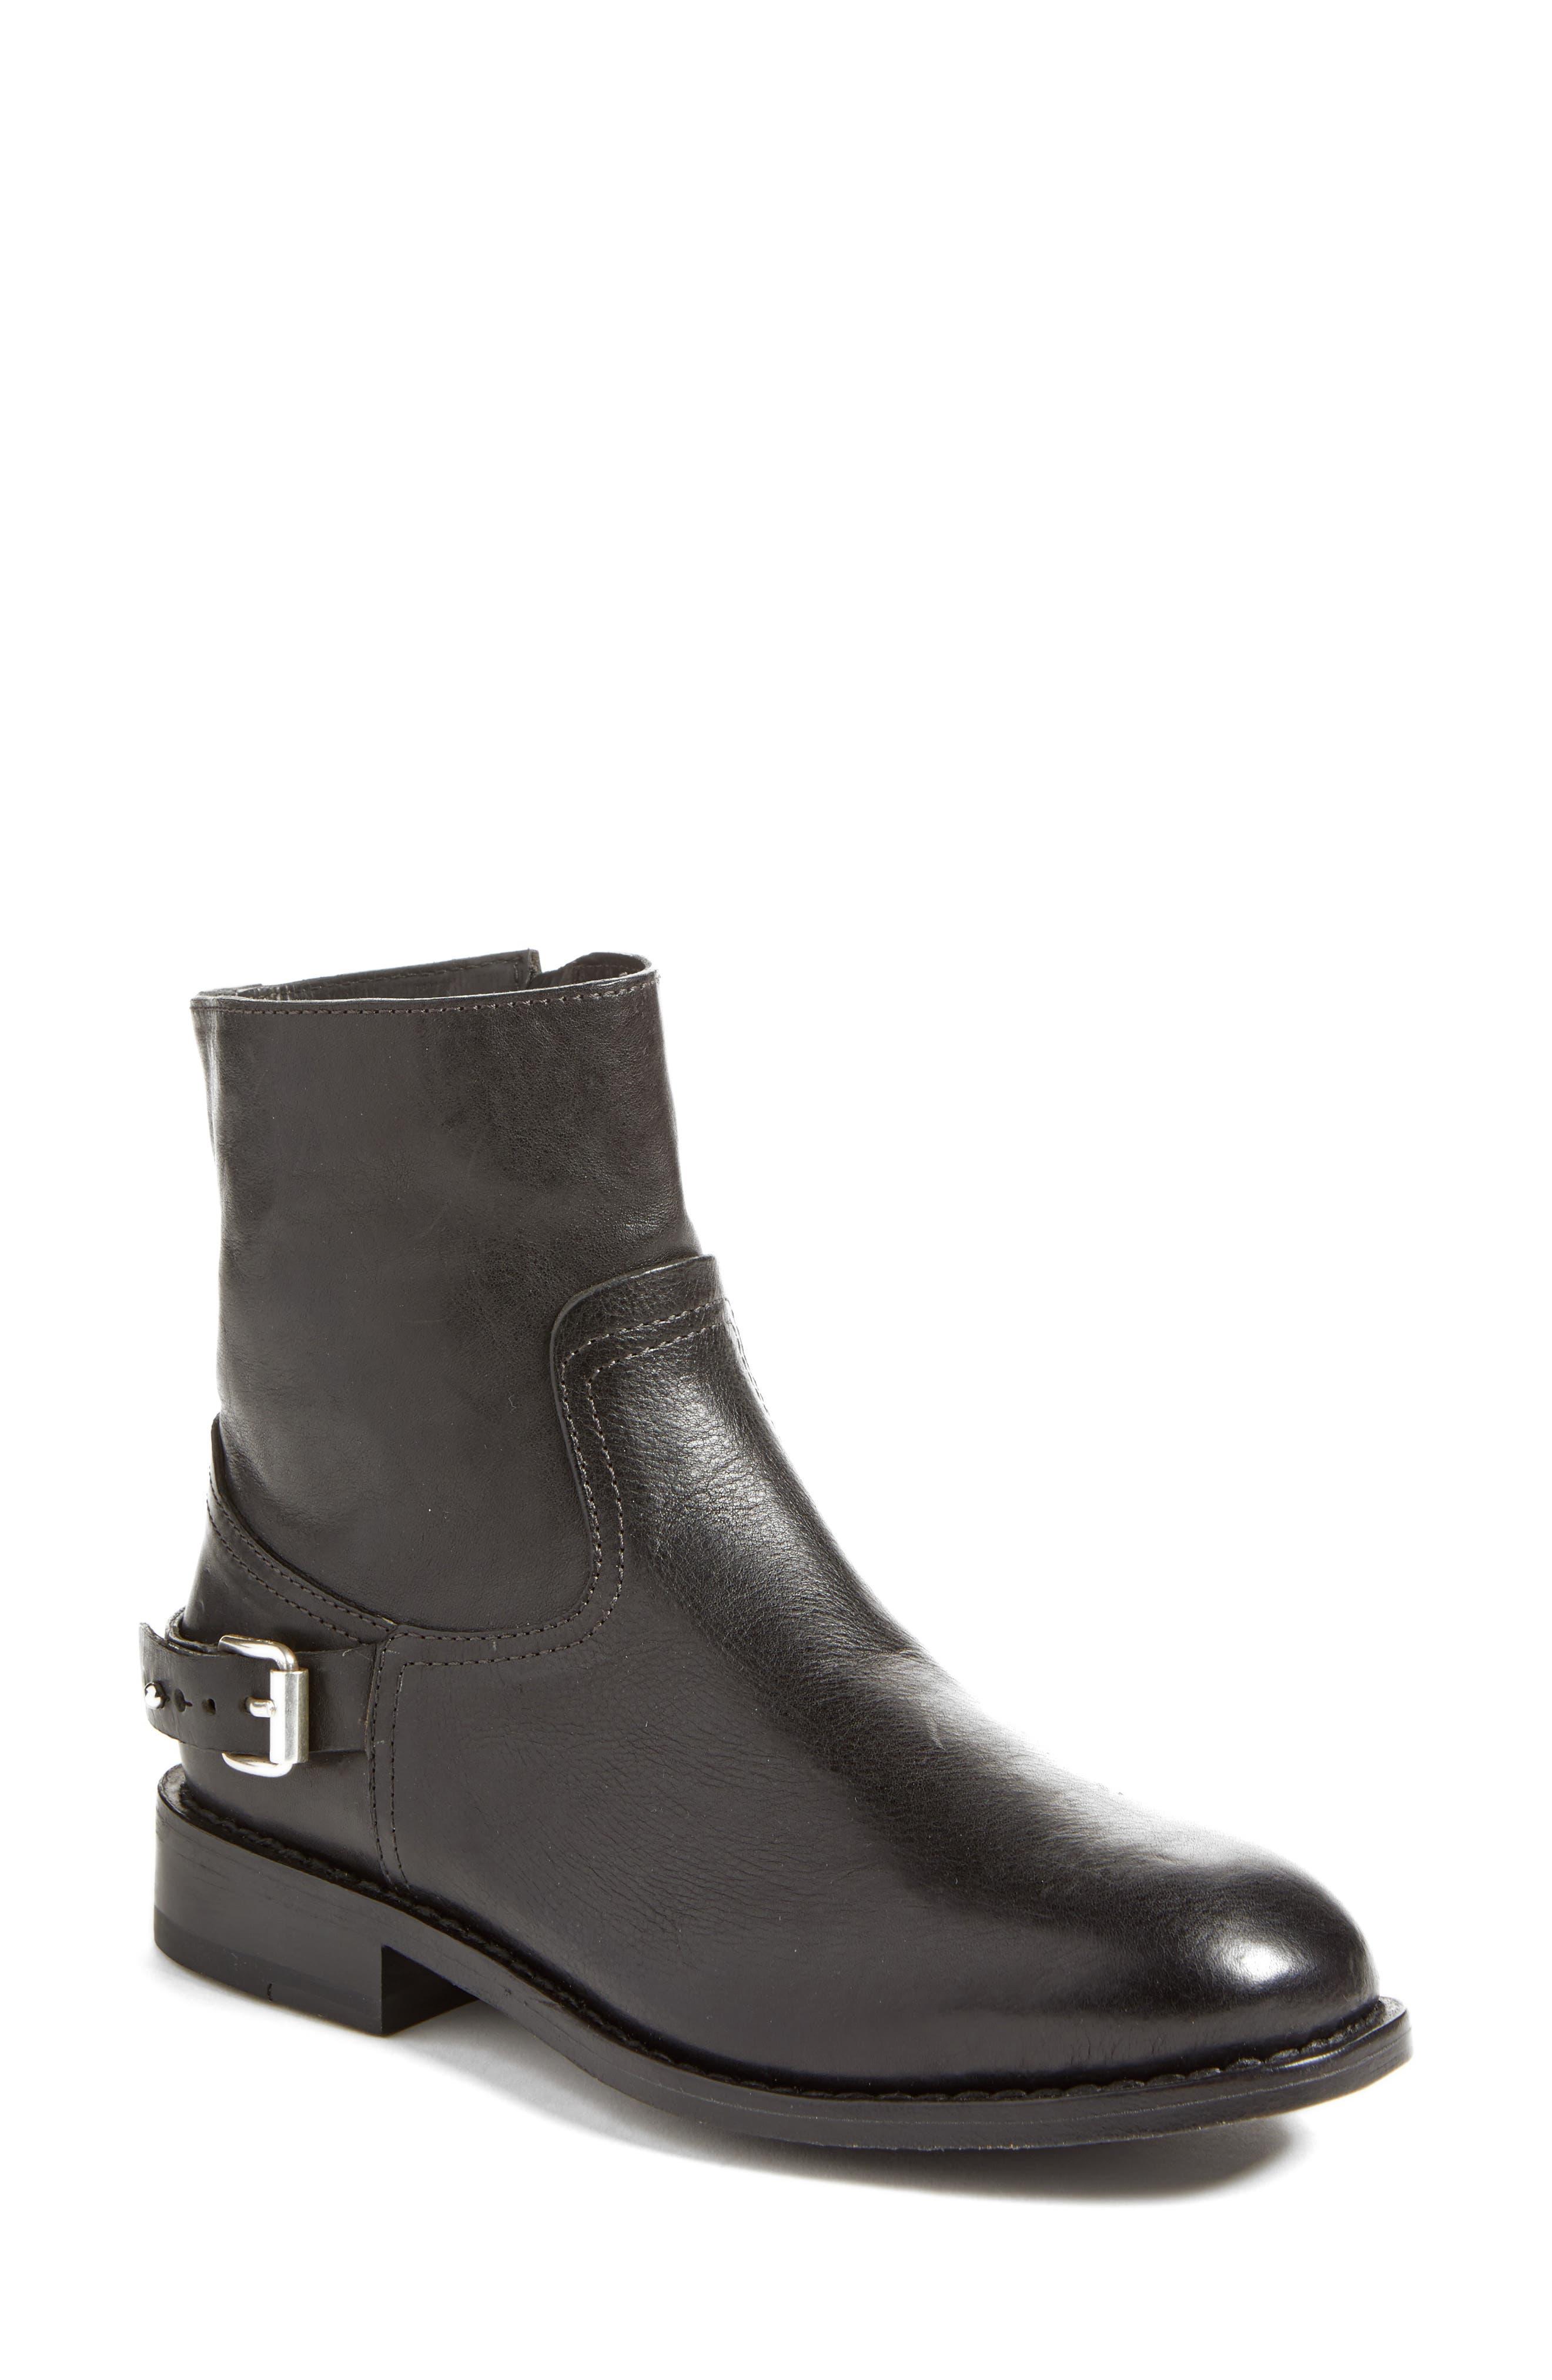 Alternate Image 1 Selected - rag & bone Moto Boot (Women)